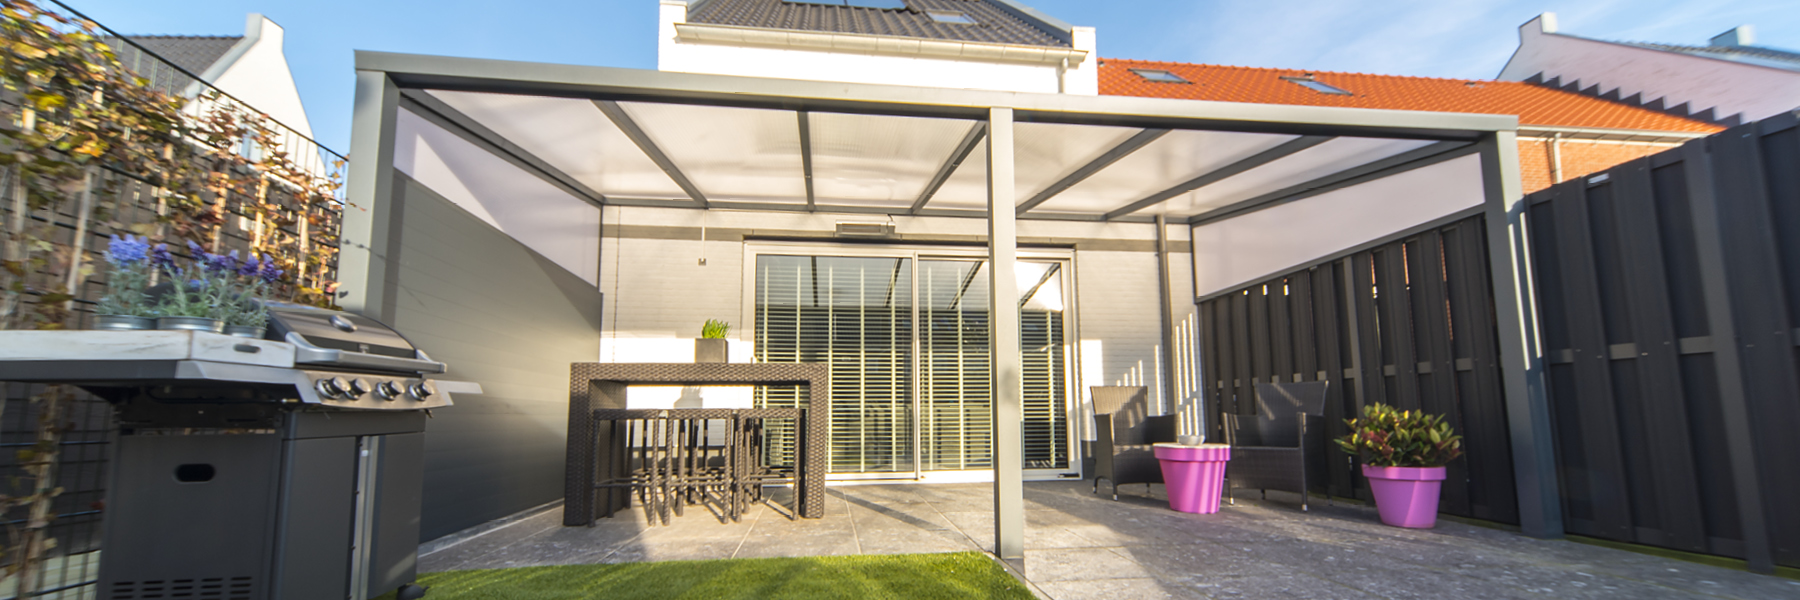 In \'t hout Sierconstructies | Greenline veranda